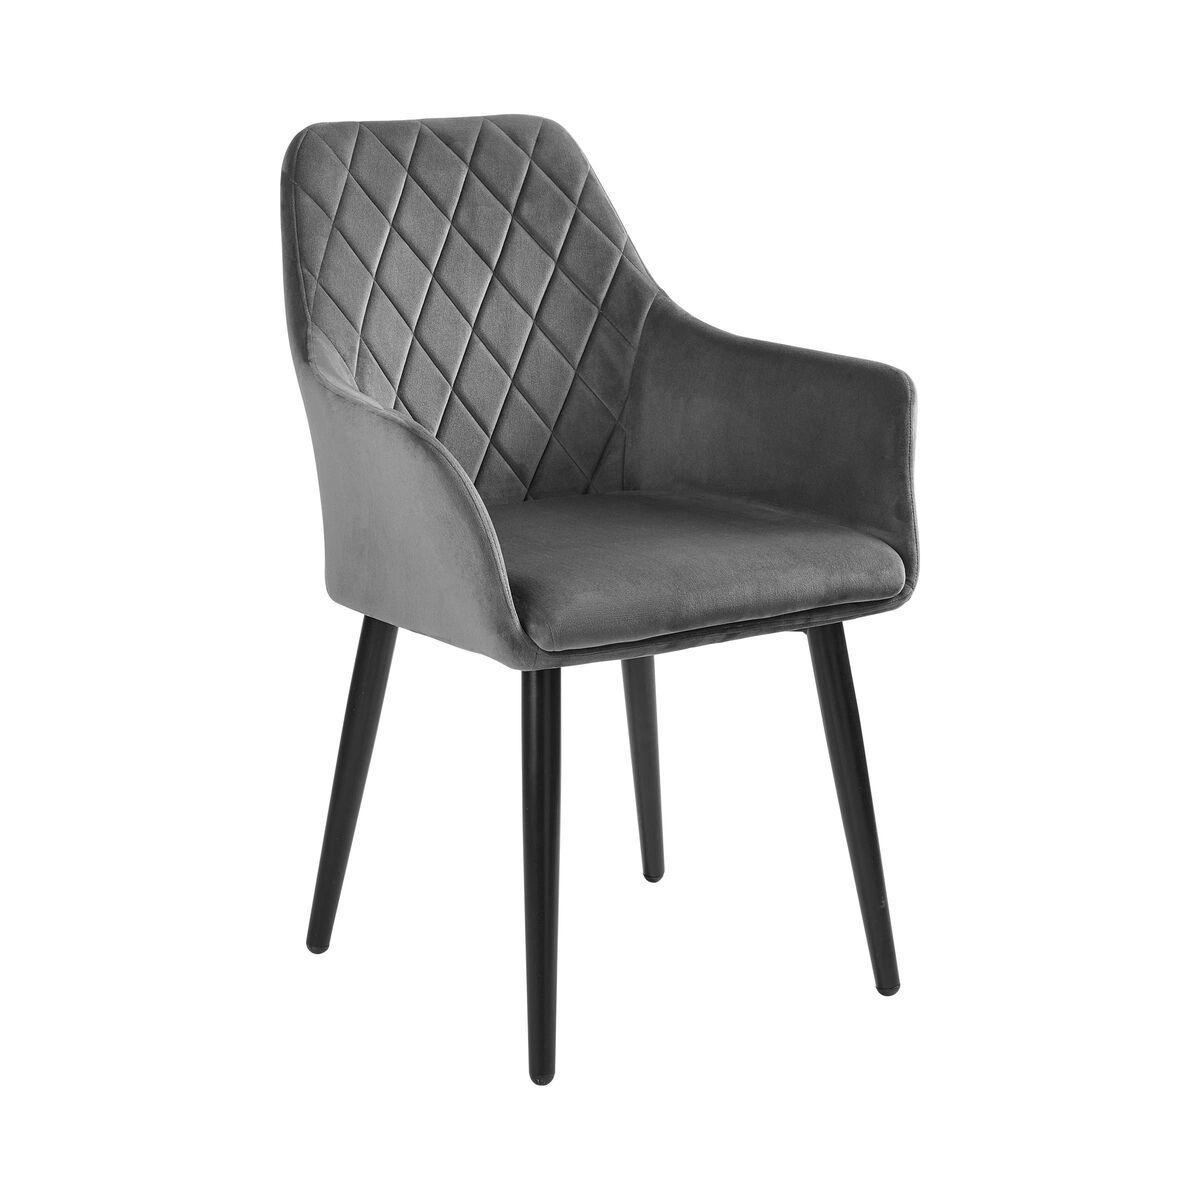 Stühle Samt Grau